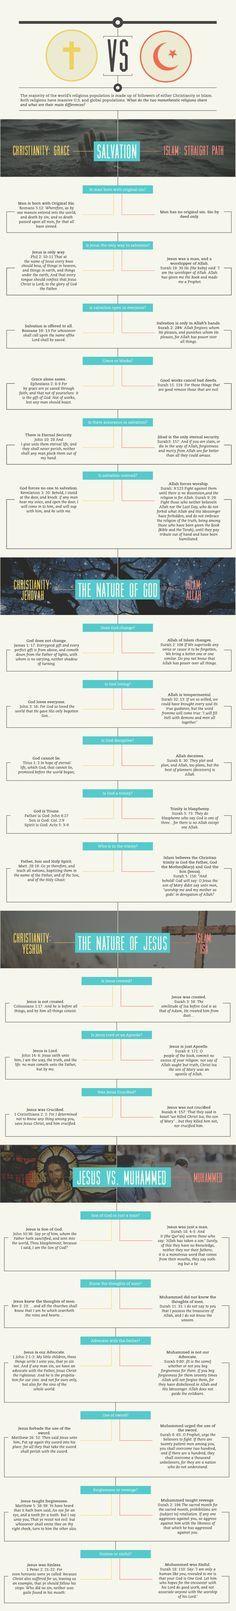 Islam vs Christianity Infographic